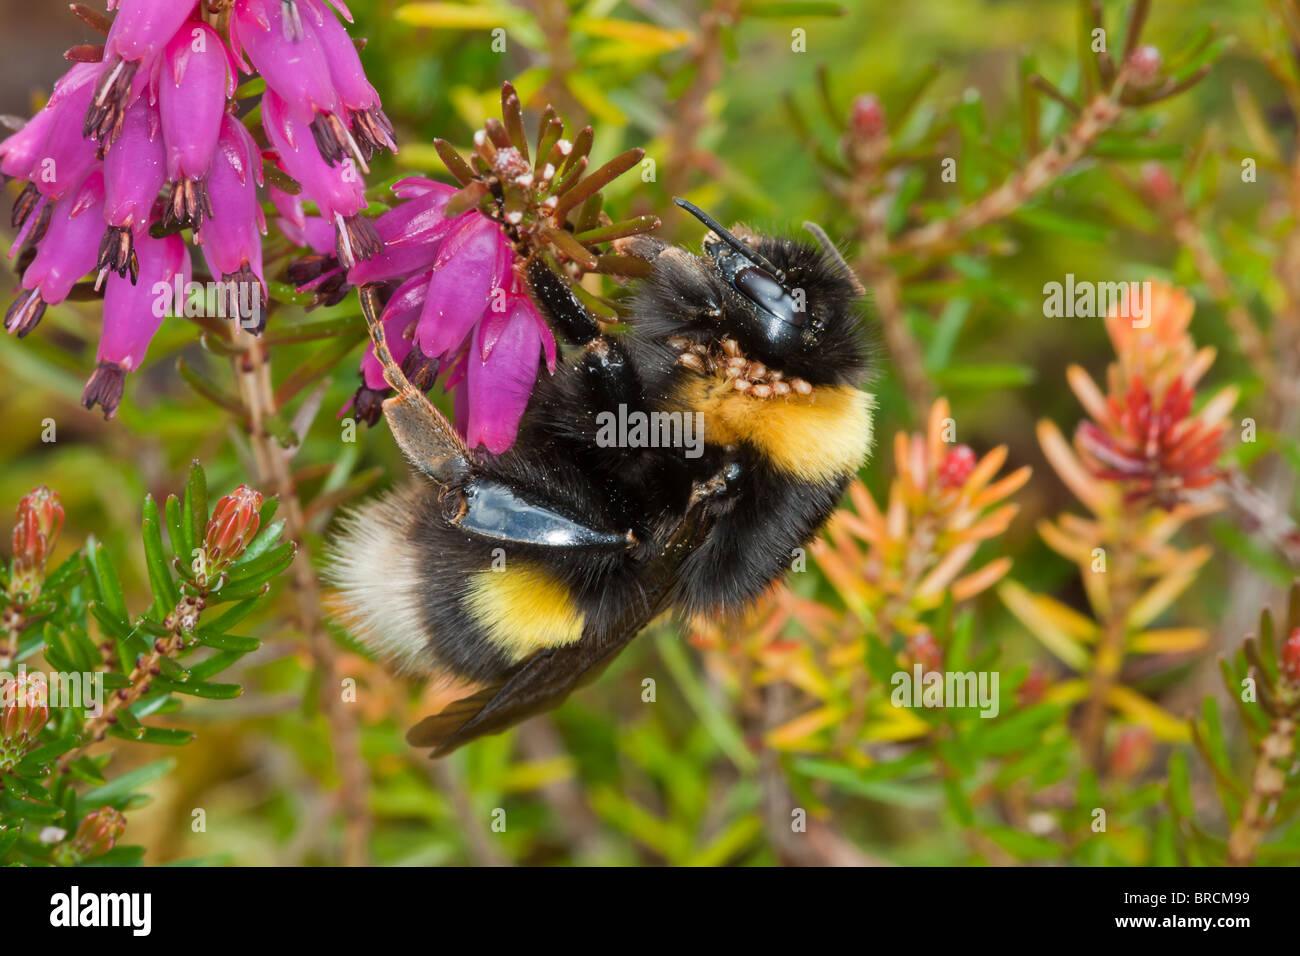 White-tailed Bumblebee, Bombus lucorum nectaring on Irish Heath variety in garden. - Stock Image